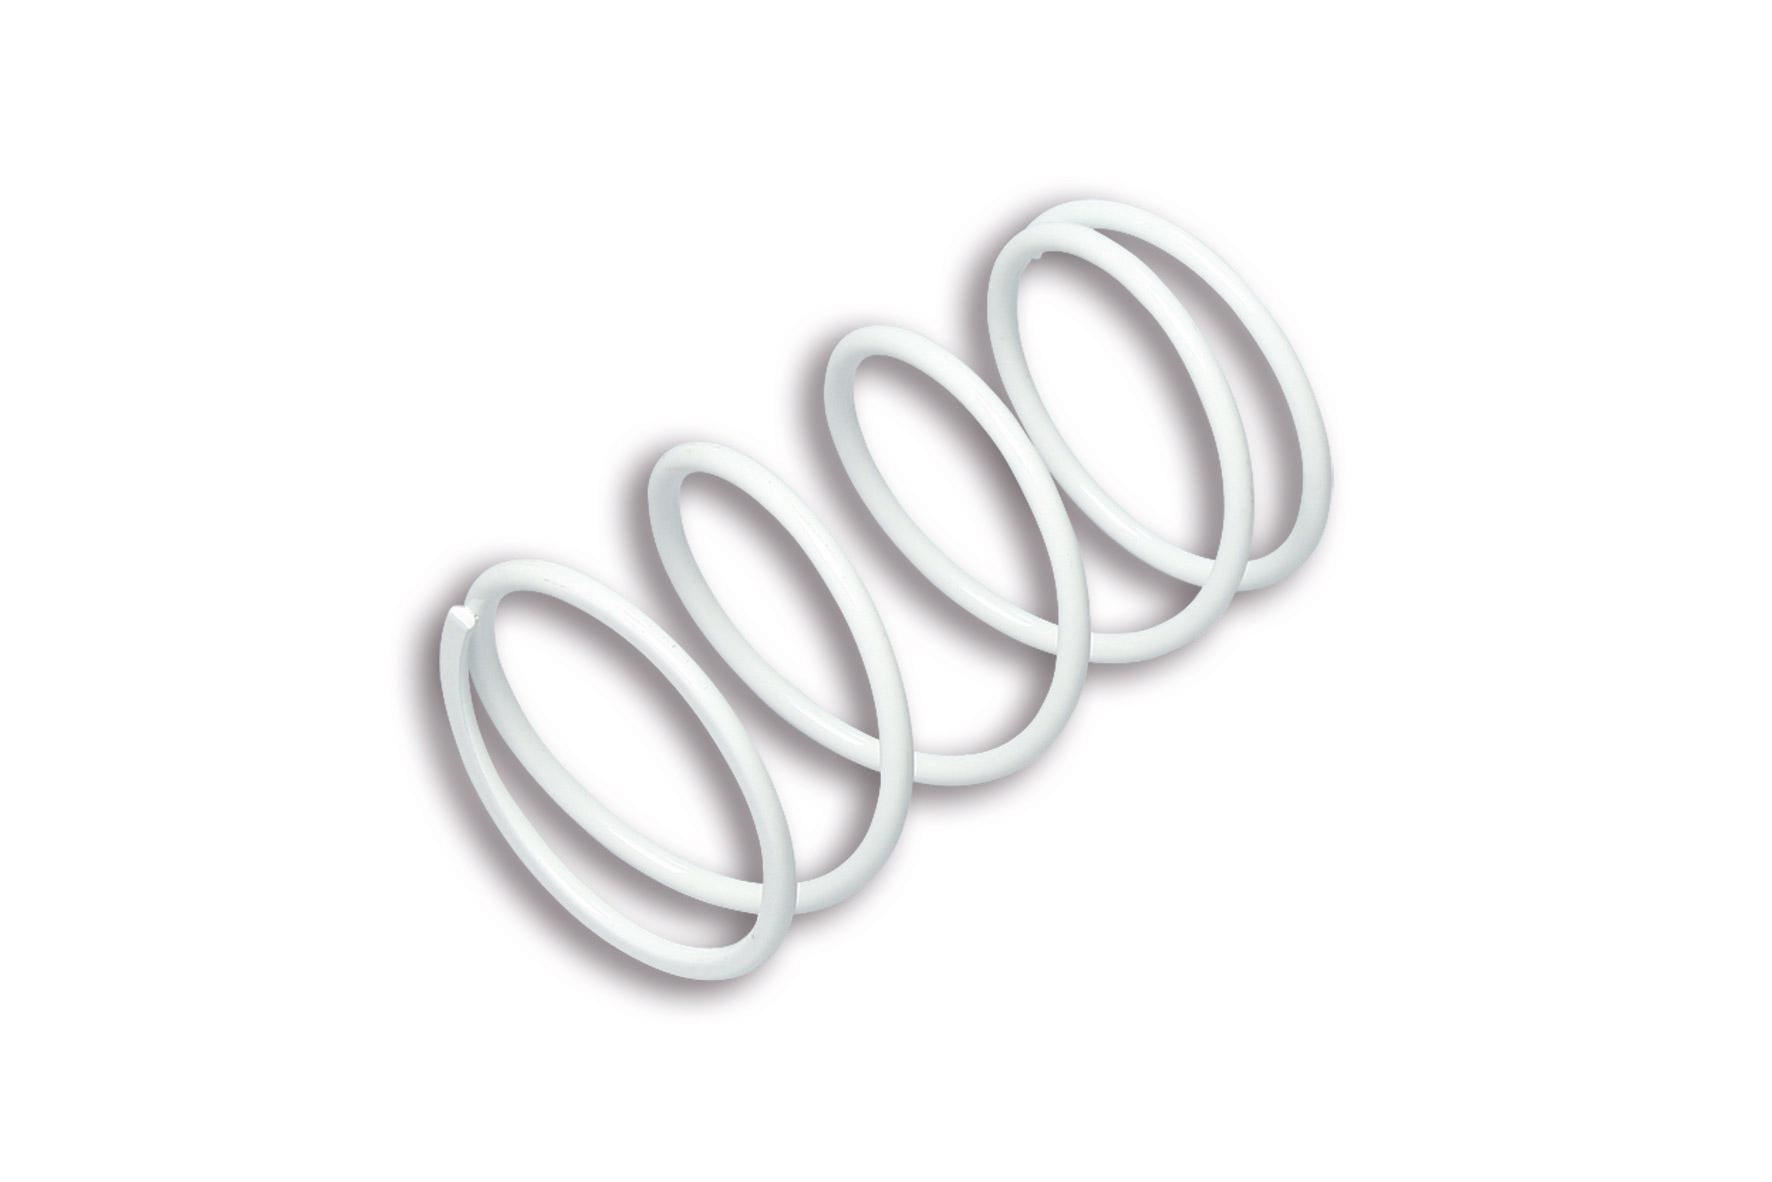 WHITE VARIATOR ADJUSTER SPRING ext.Ø 65x116mm thread Ø 4,5mm 6,2k